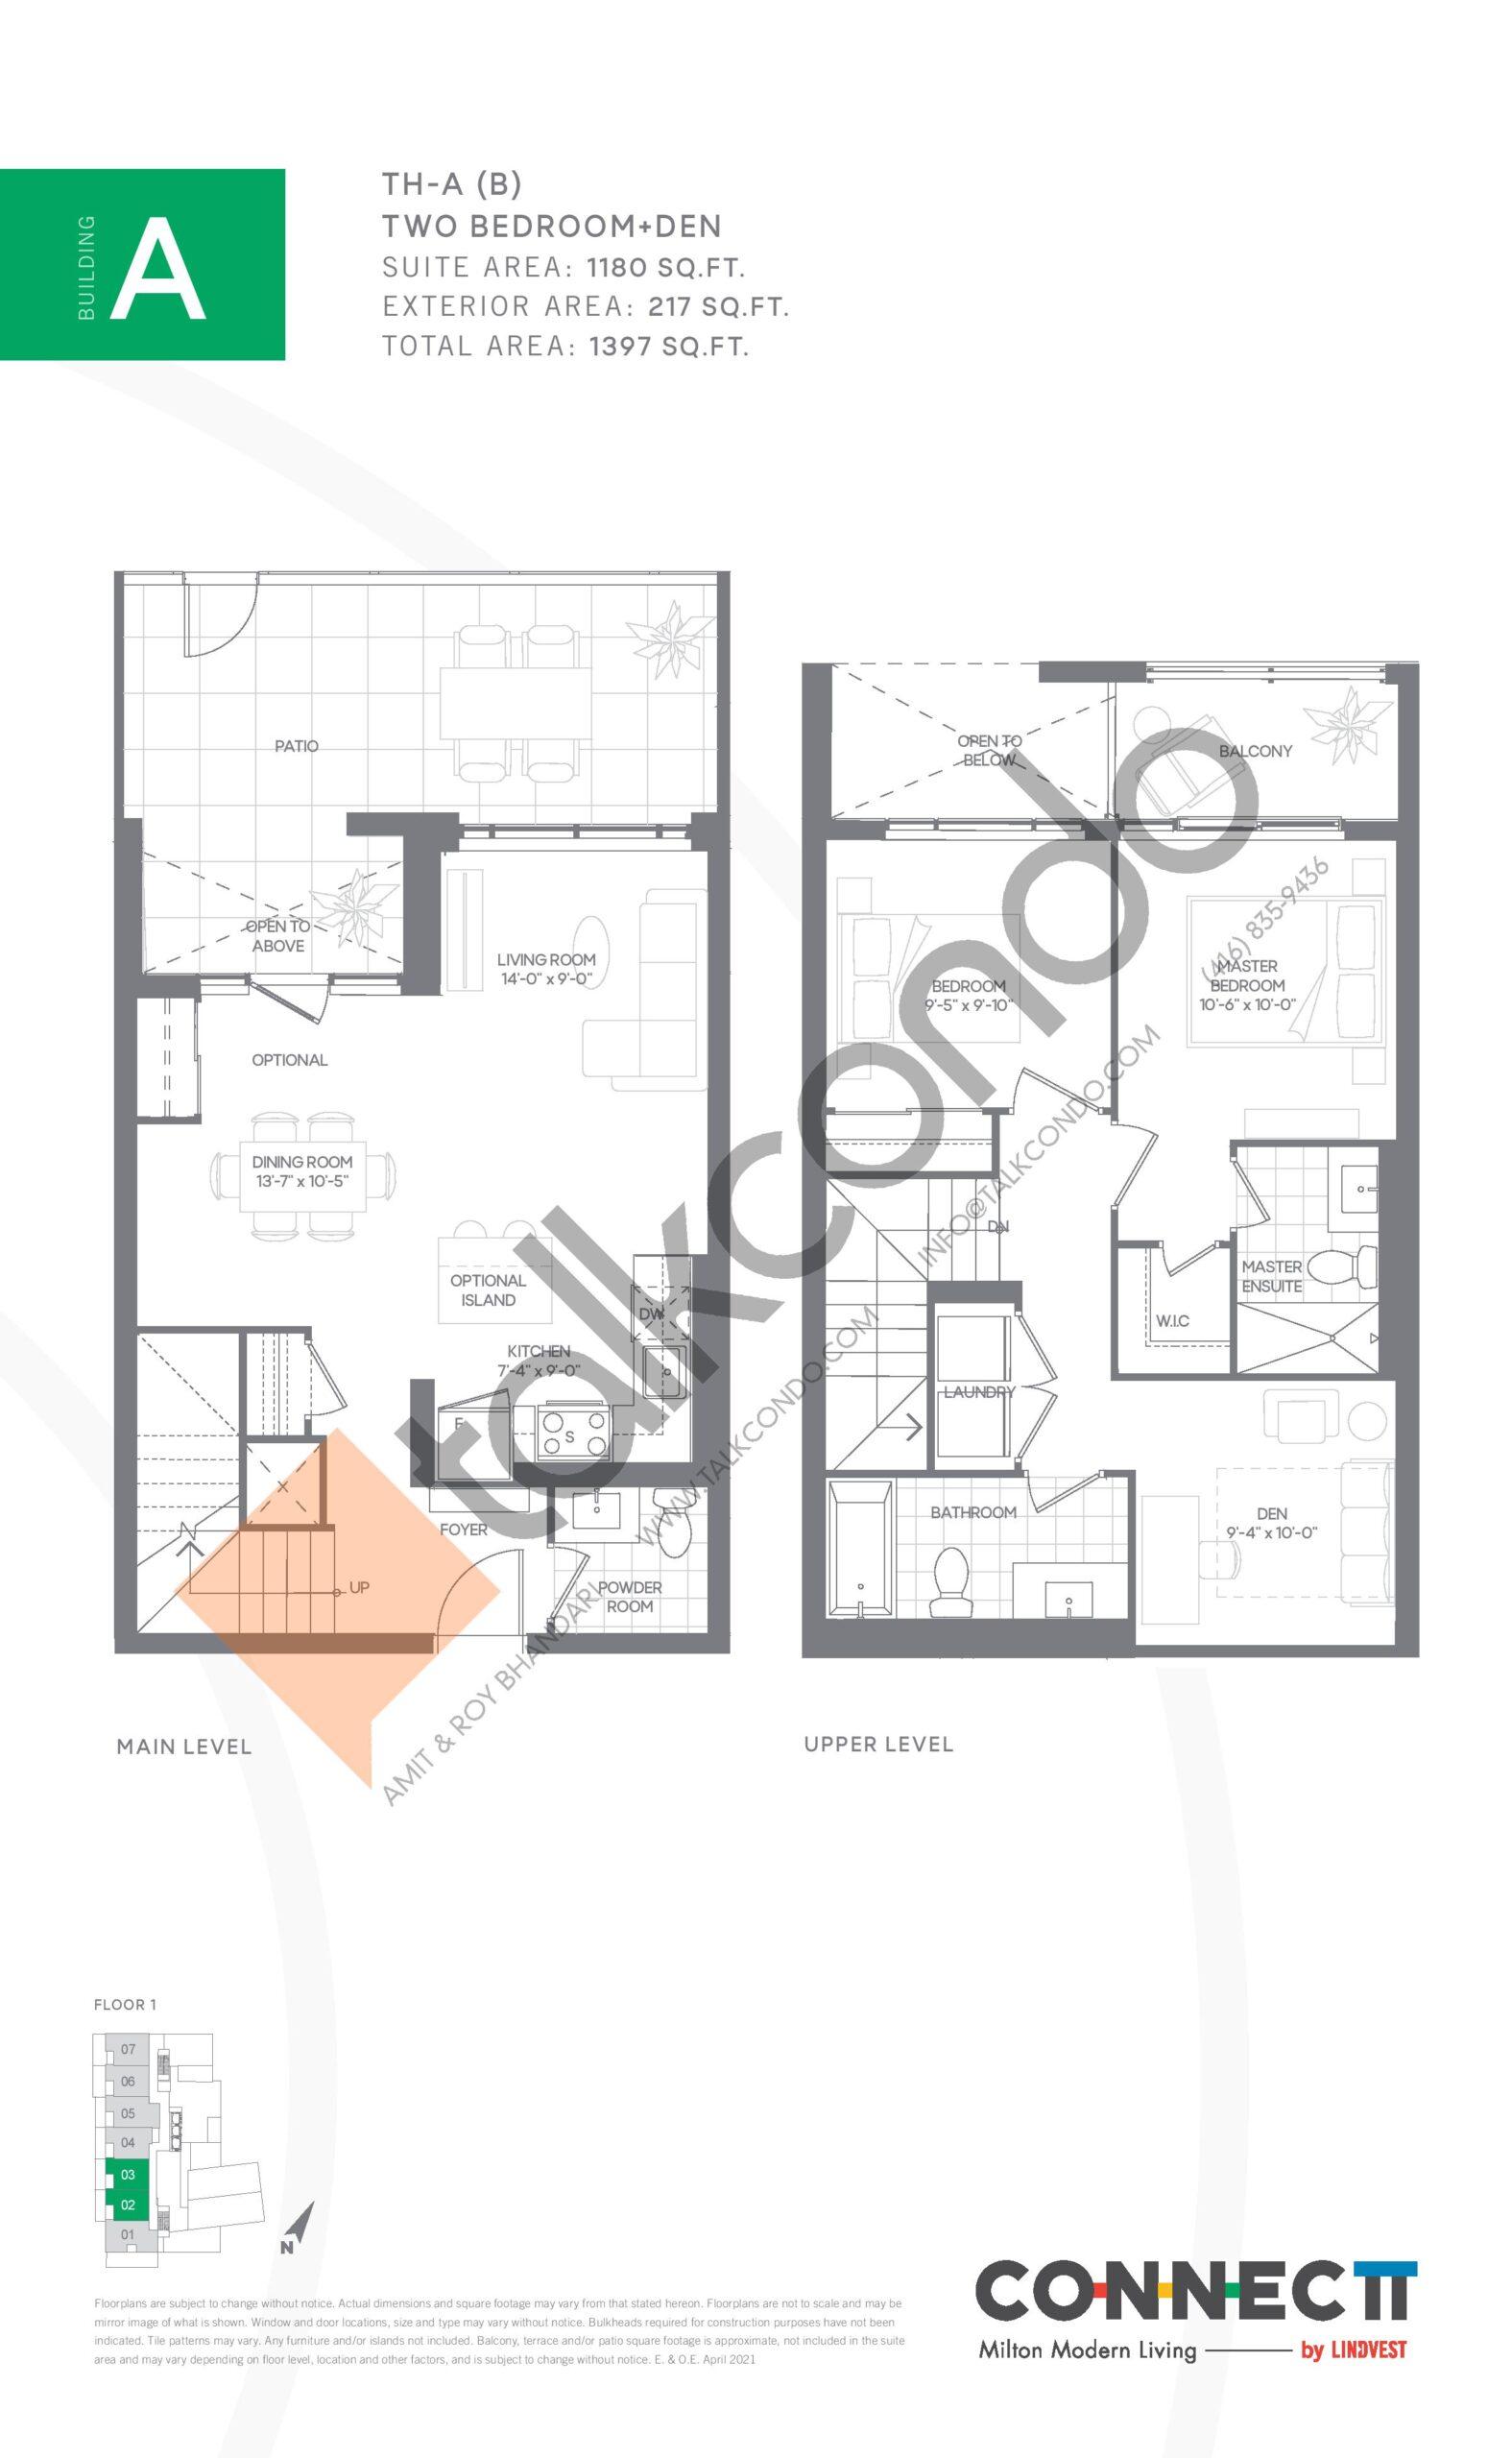 TH-A (B) Floor Plan at Connectt Urban Community Condos - 1180 sq.ft